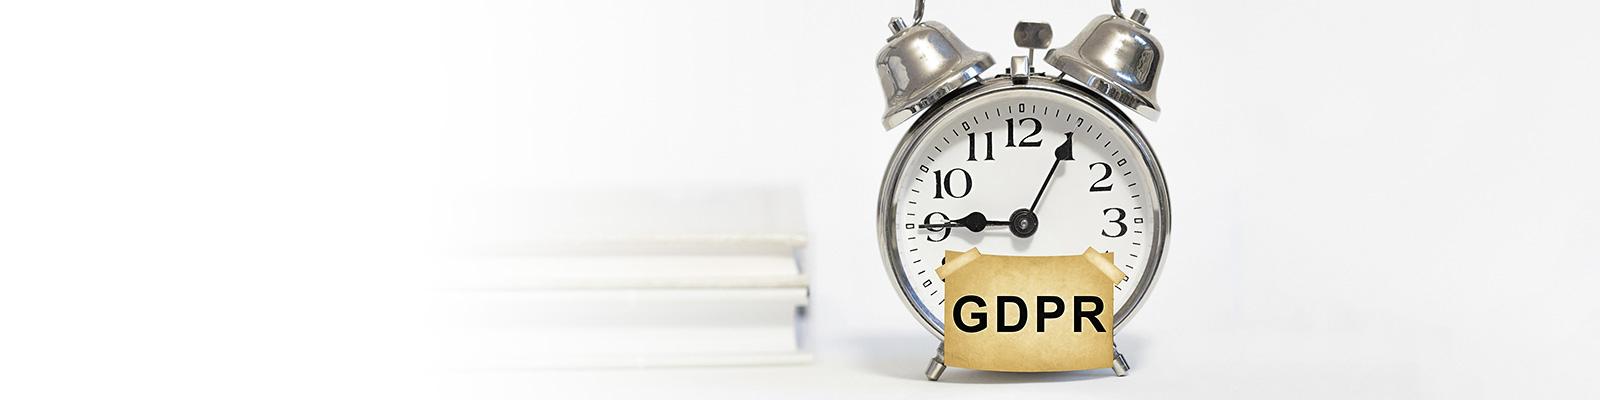 GDPR 時間 報告 イメージ